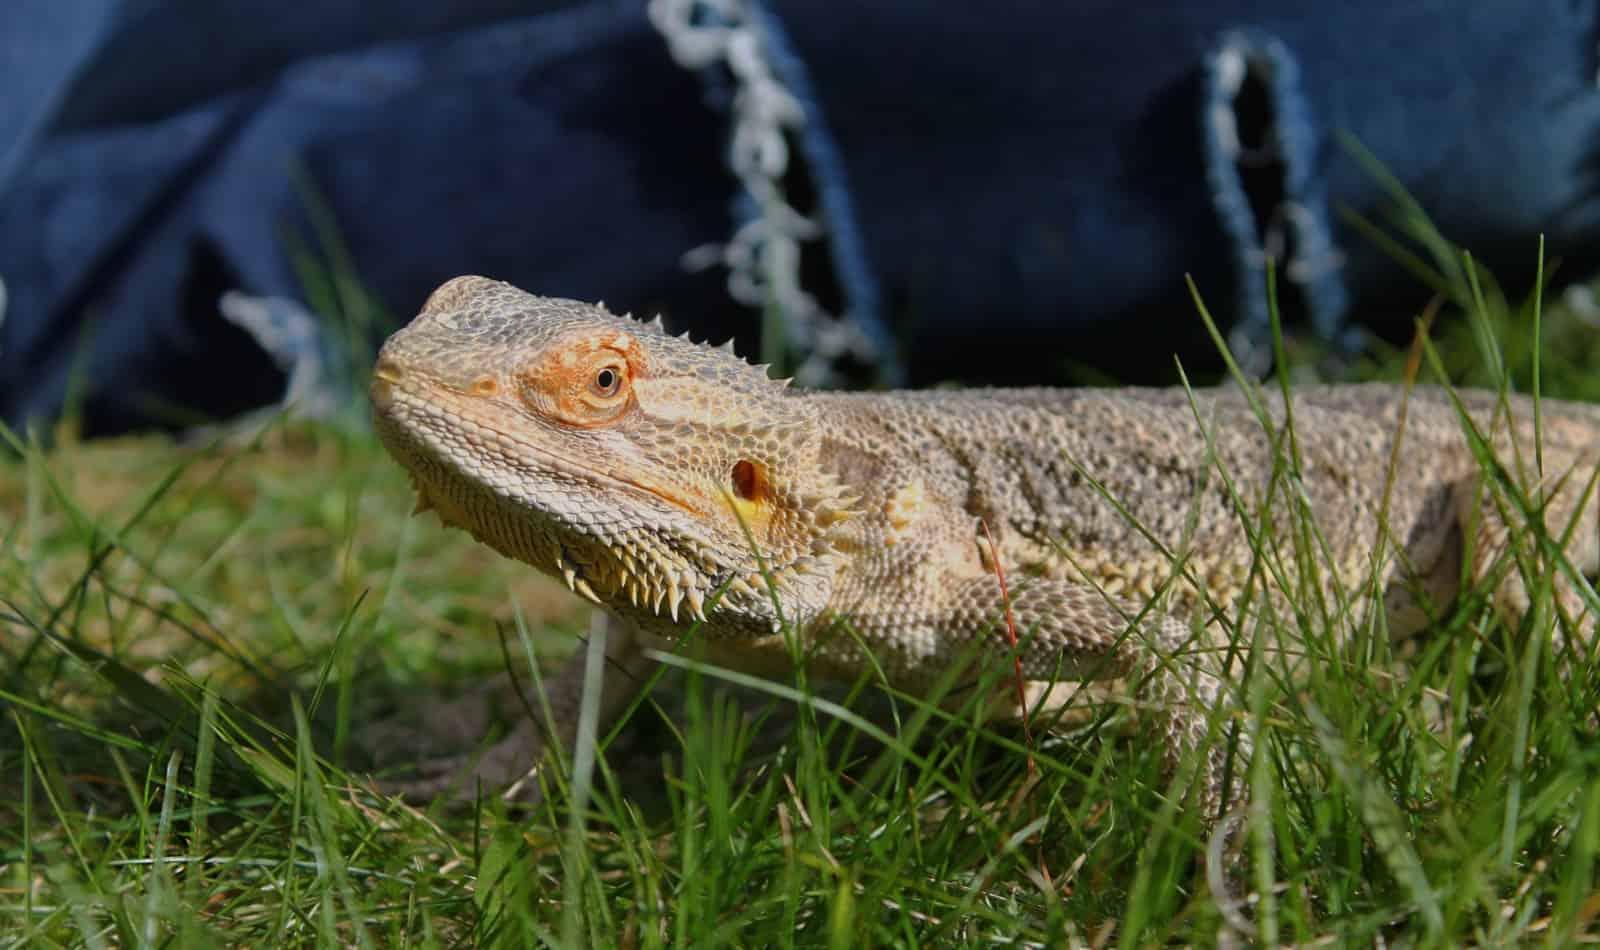 a bearded dragon walking on a grass